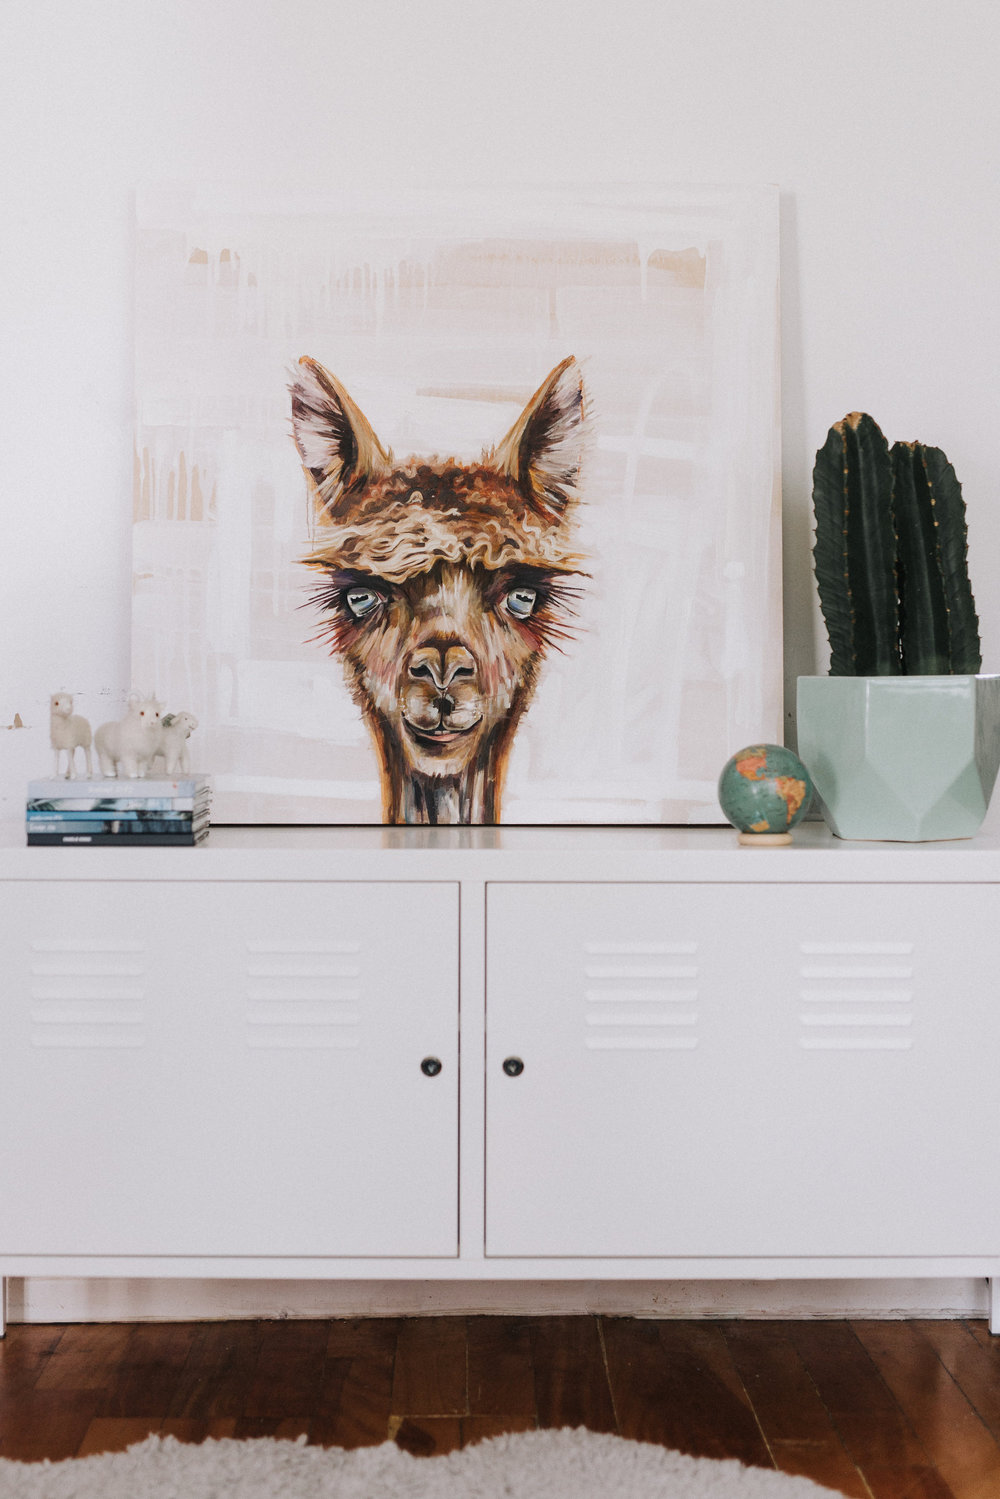 llama2-melissa-townsend-art.jpg